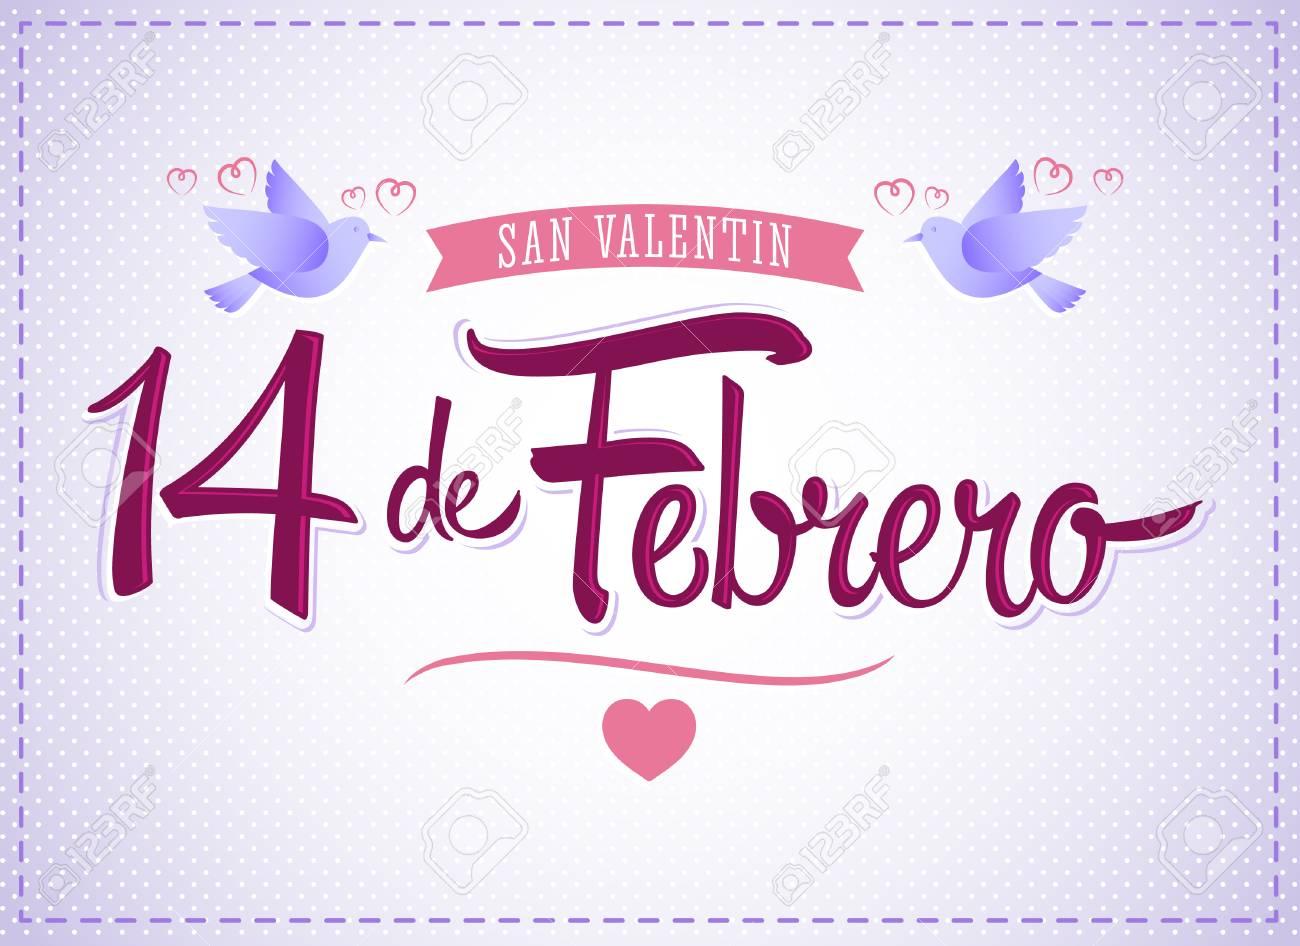 14 De Febrero Dia De San Valentin, Spanish Translation: February 14  Valentines Day,